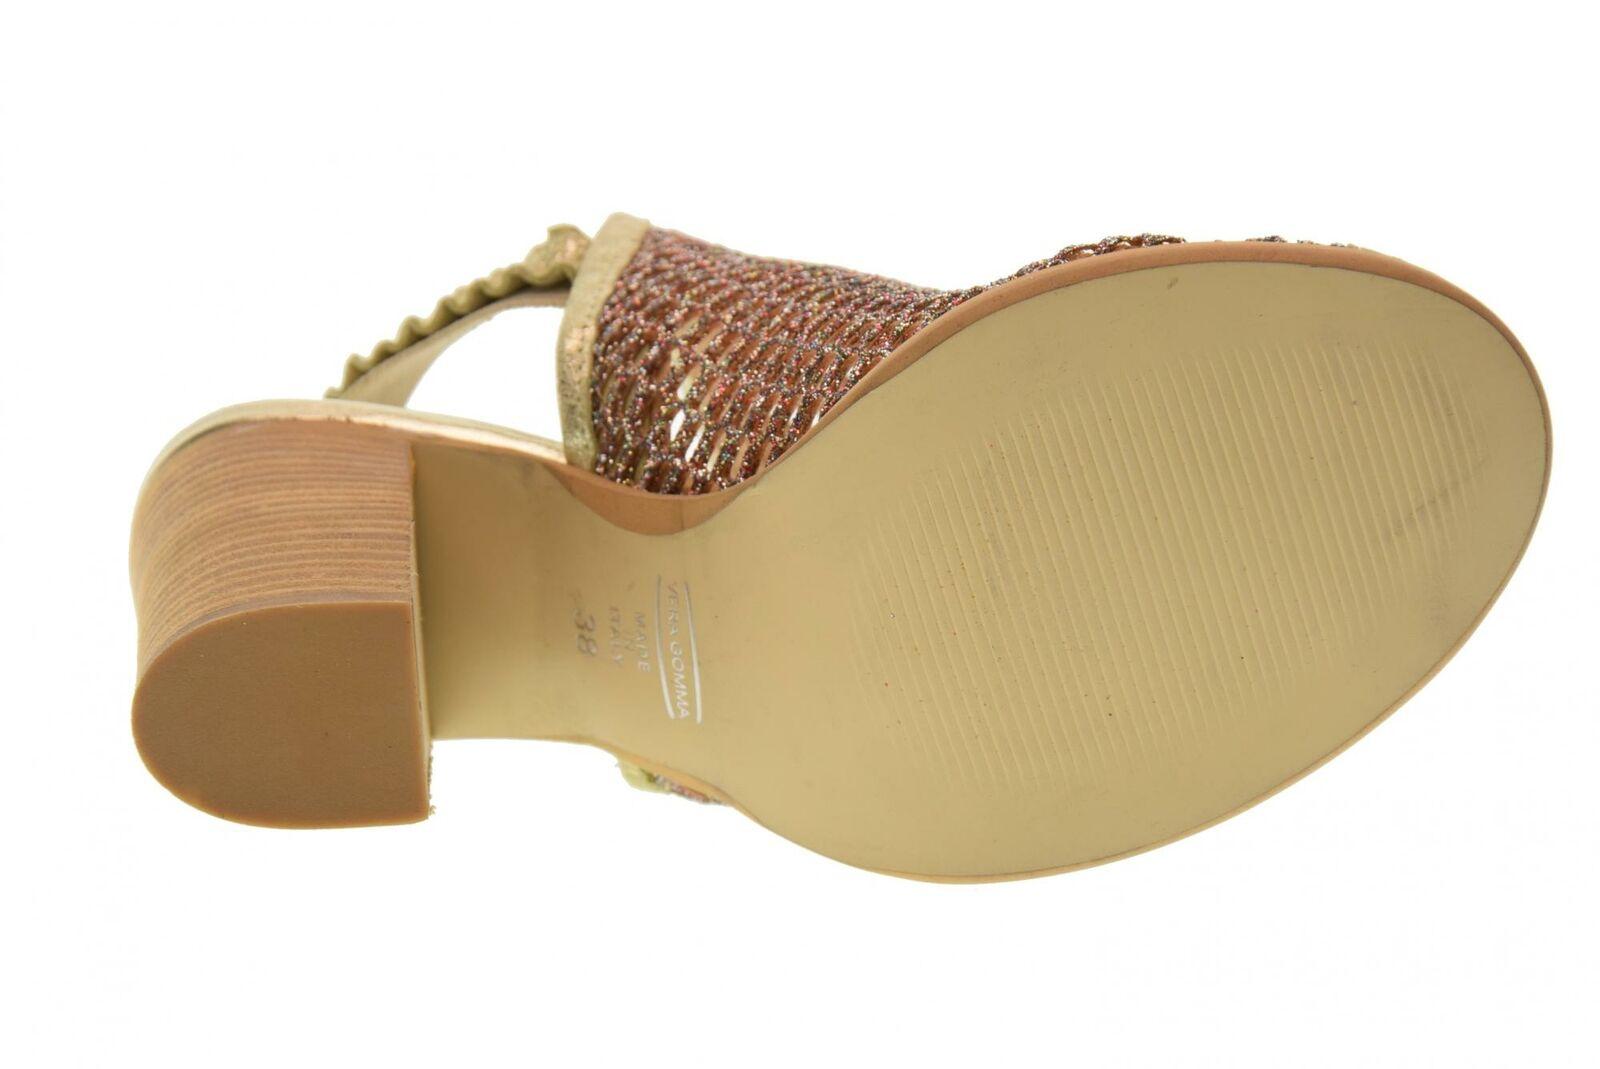 Erman's P18u femmes femmes femmes chaussures sandal 145 or 6d1ac0